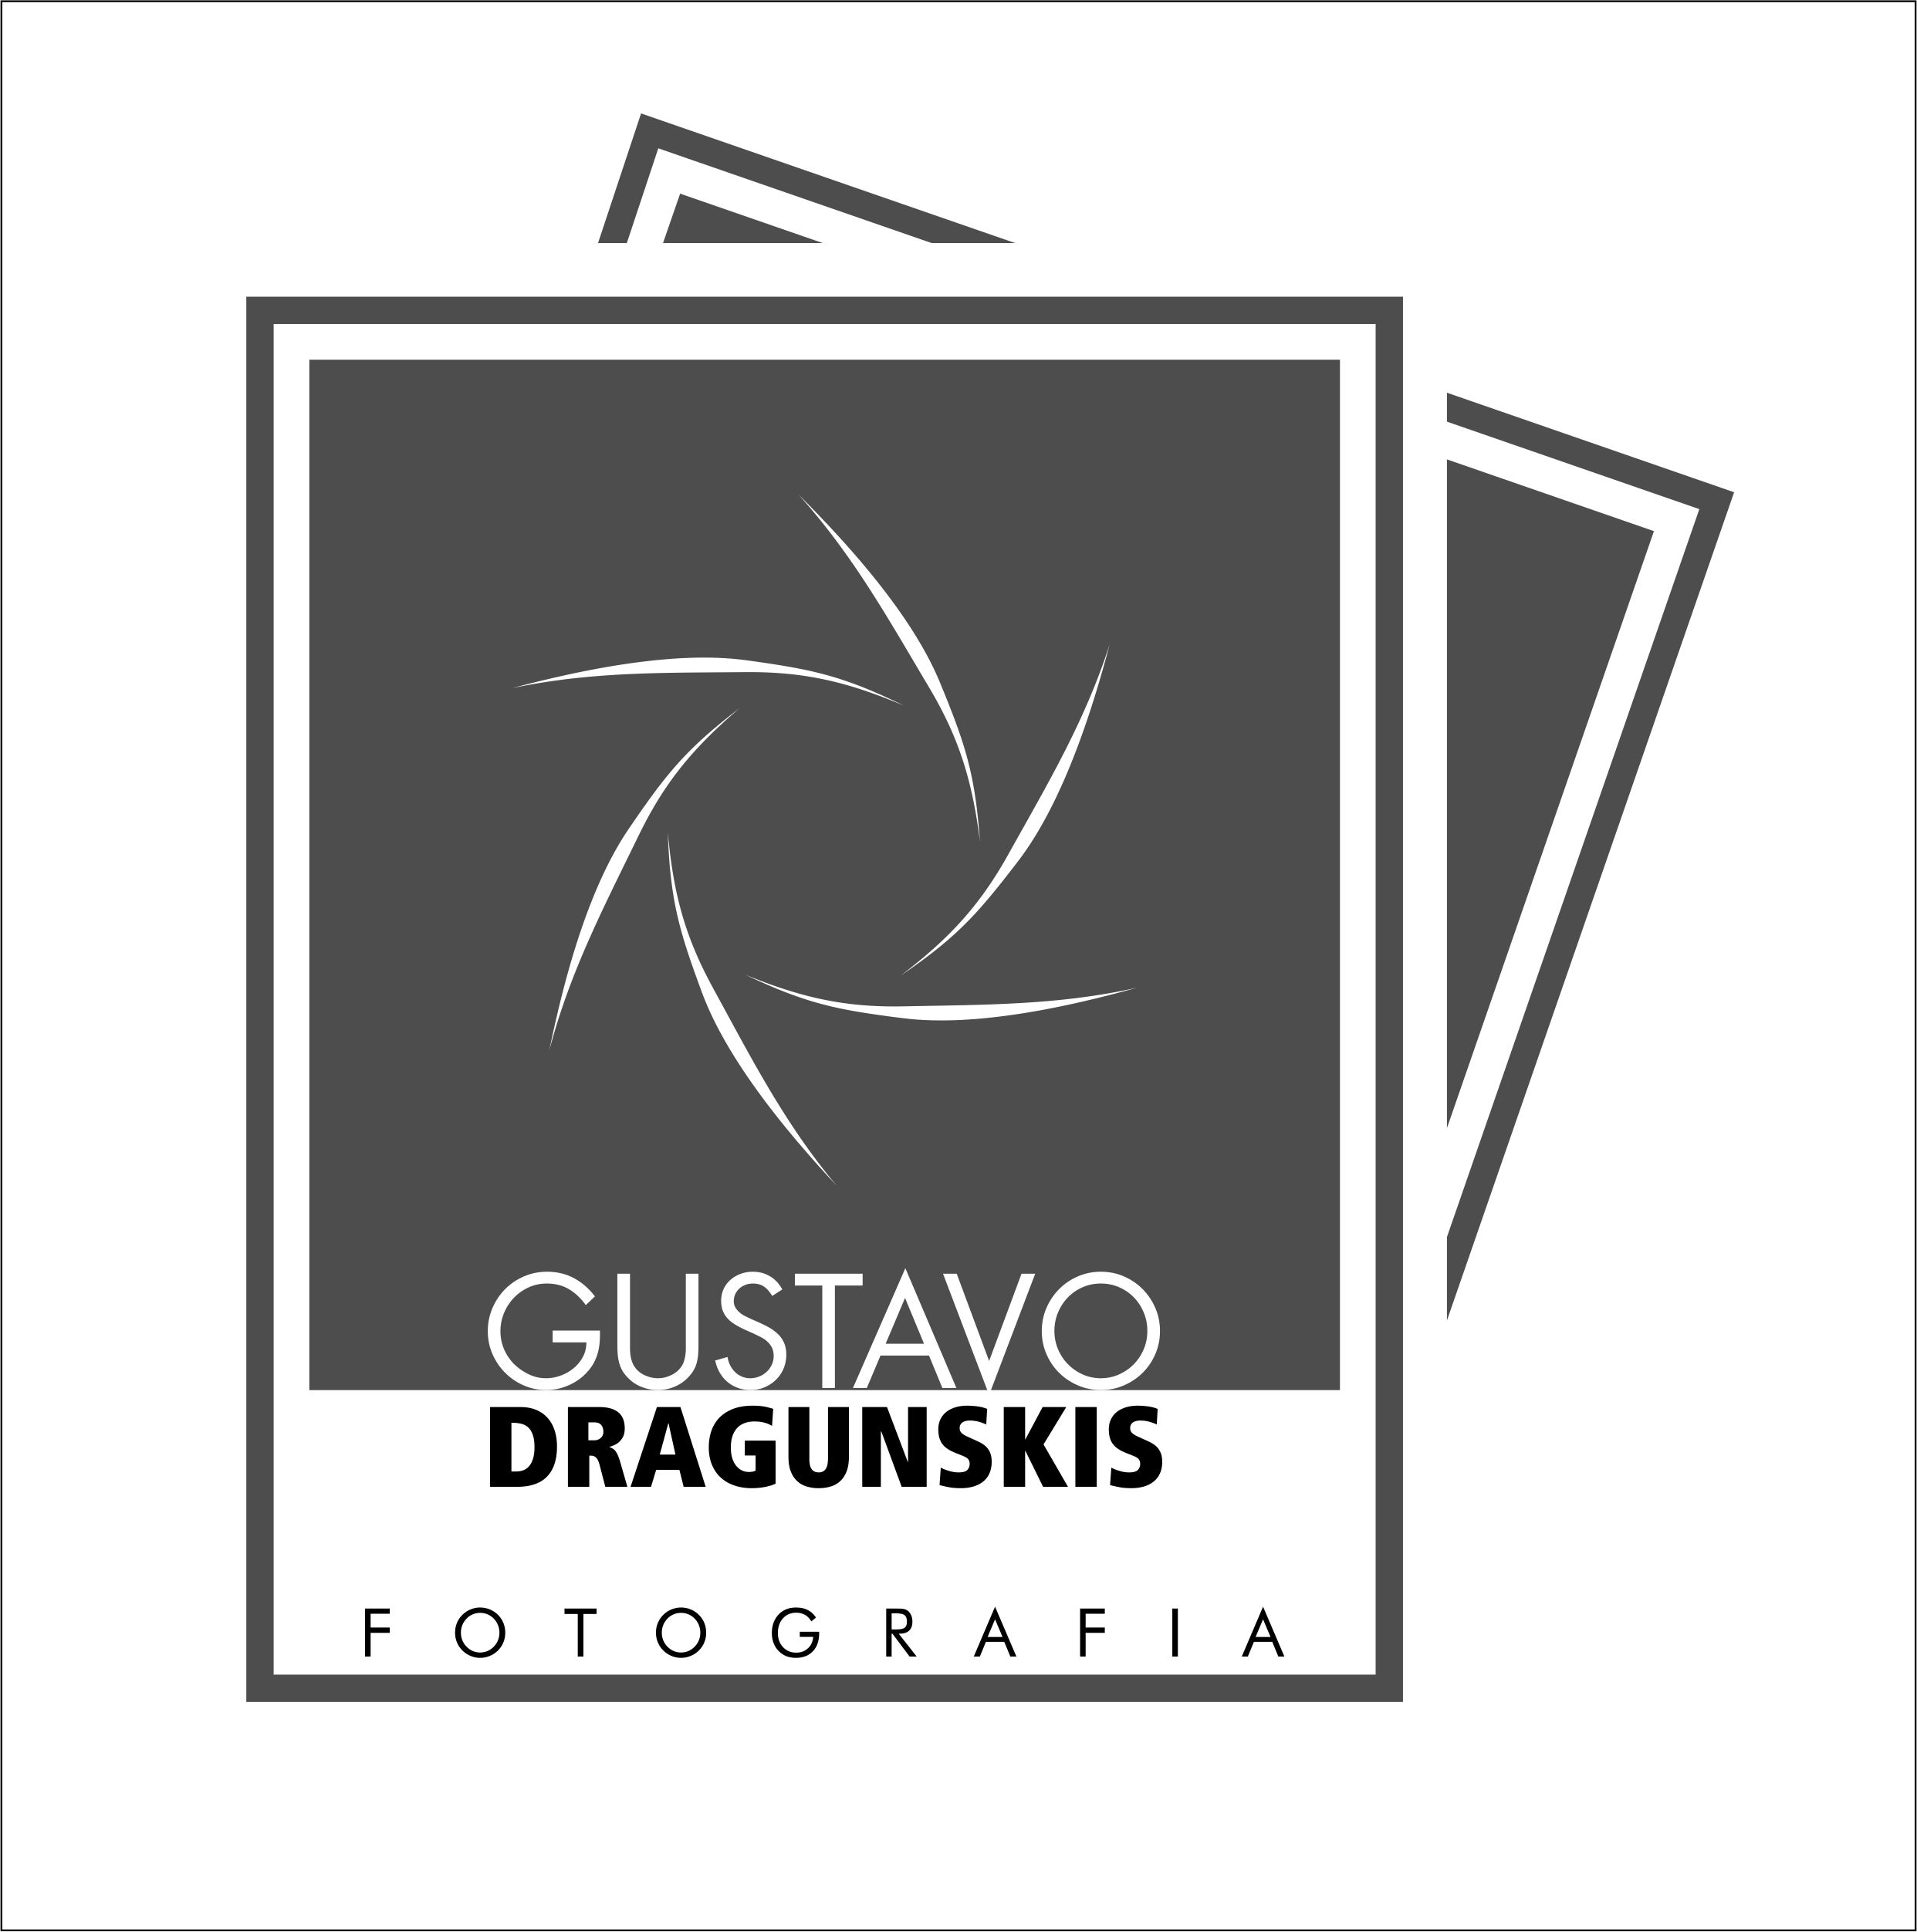 Logotipo de Gustavo Dragunskis